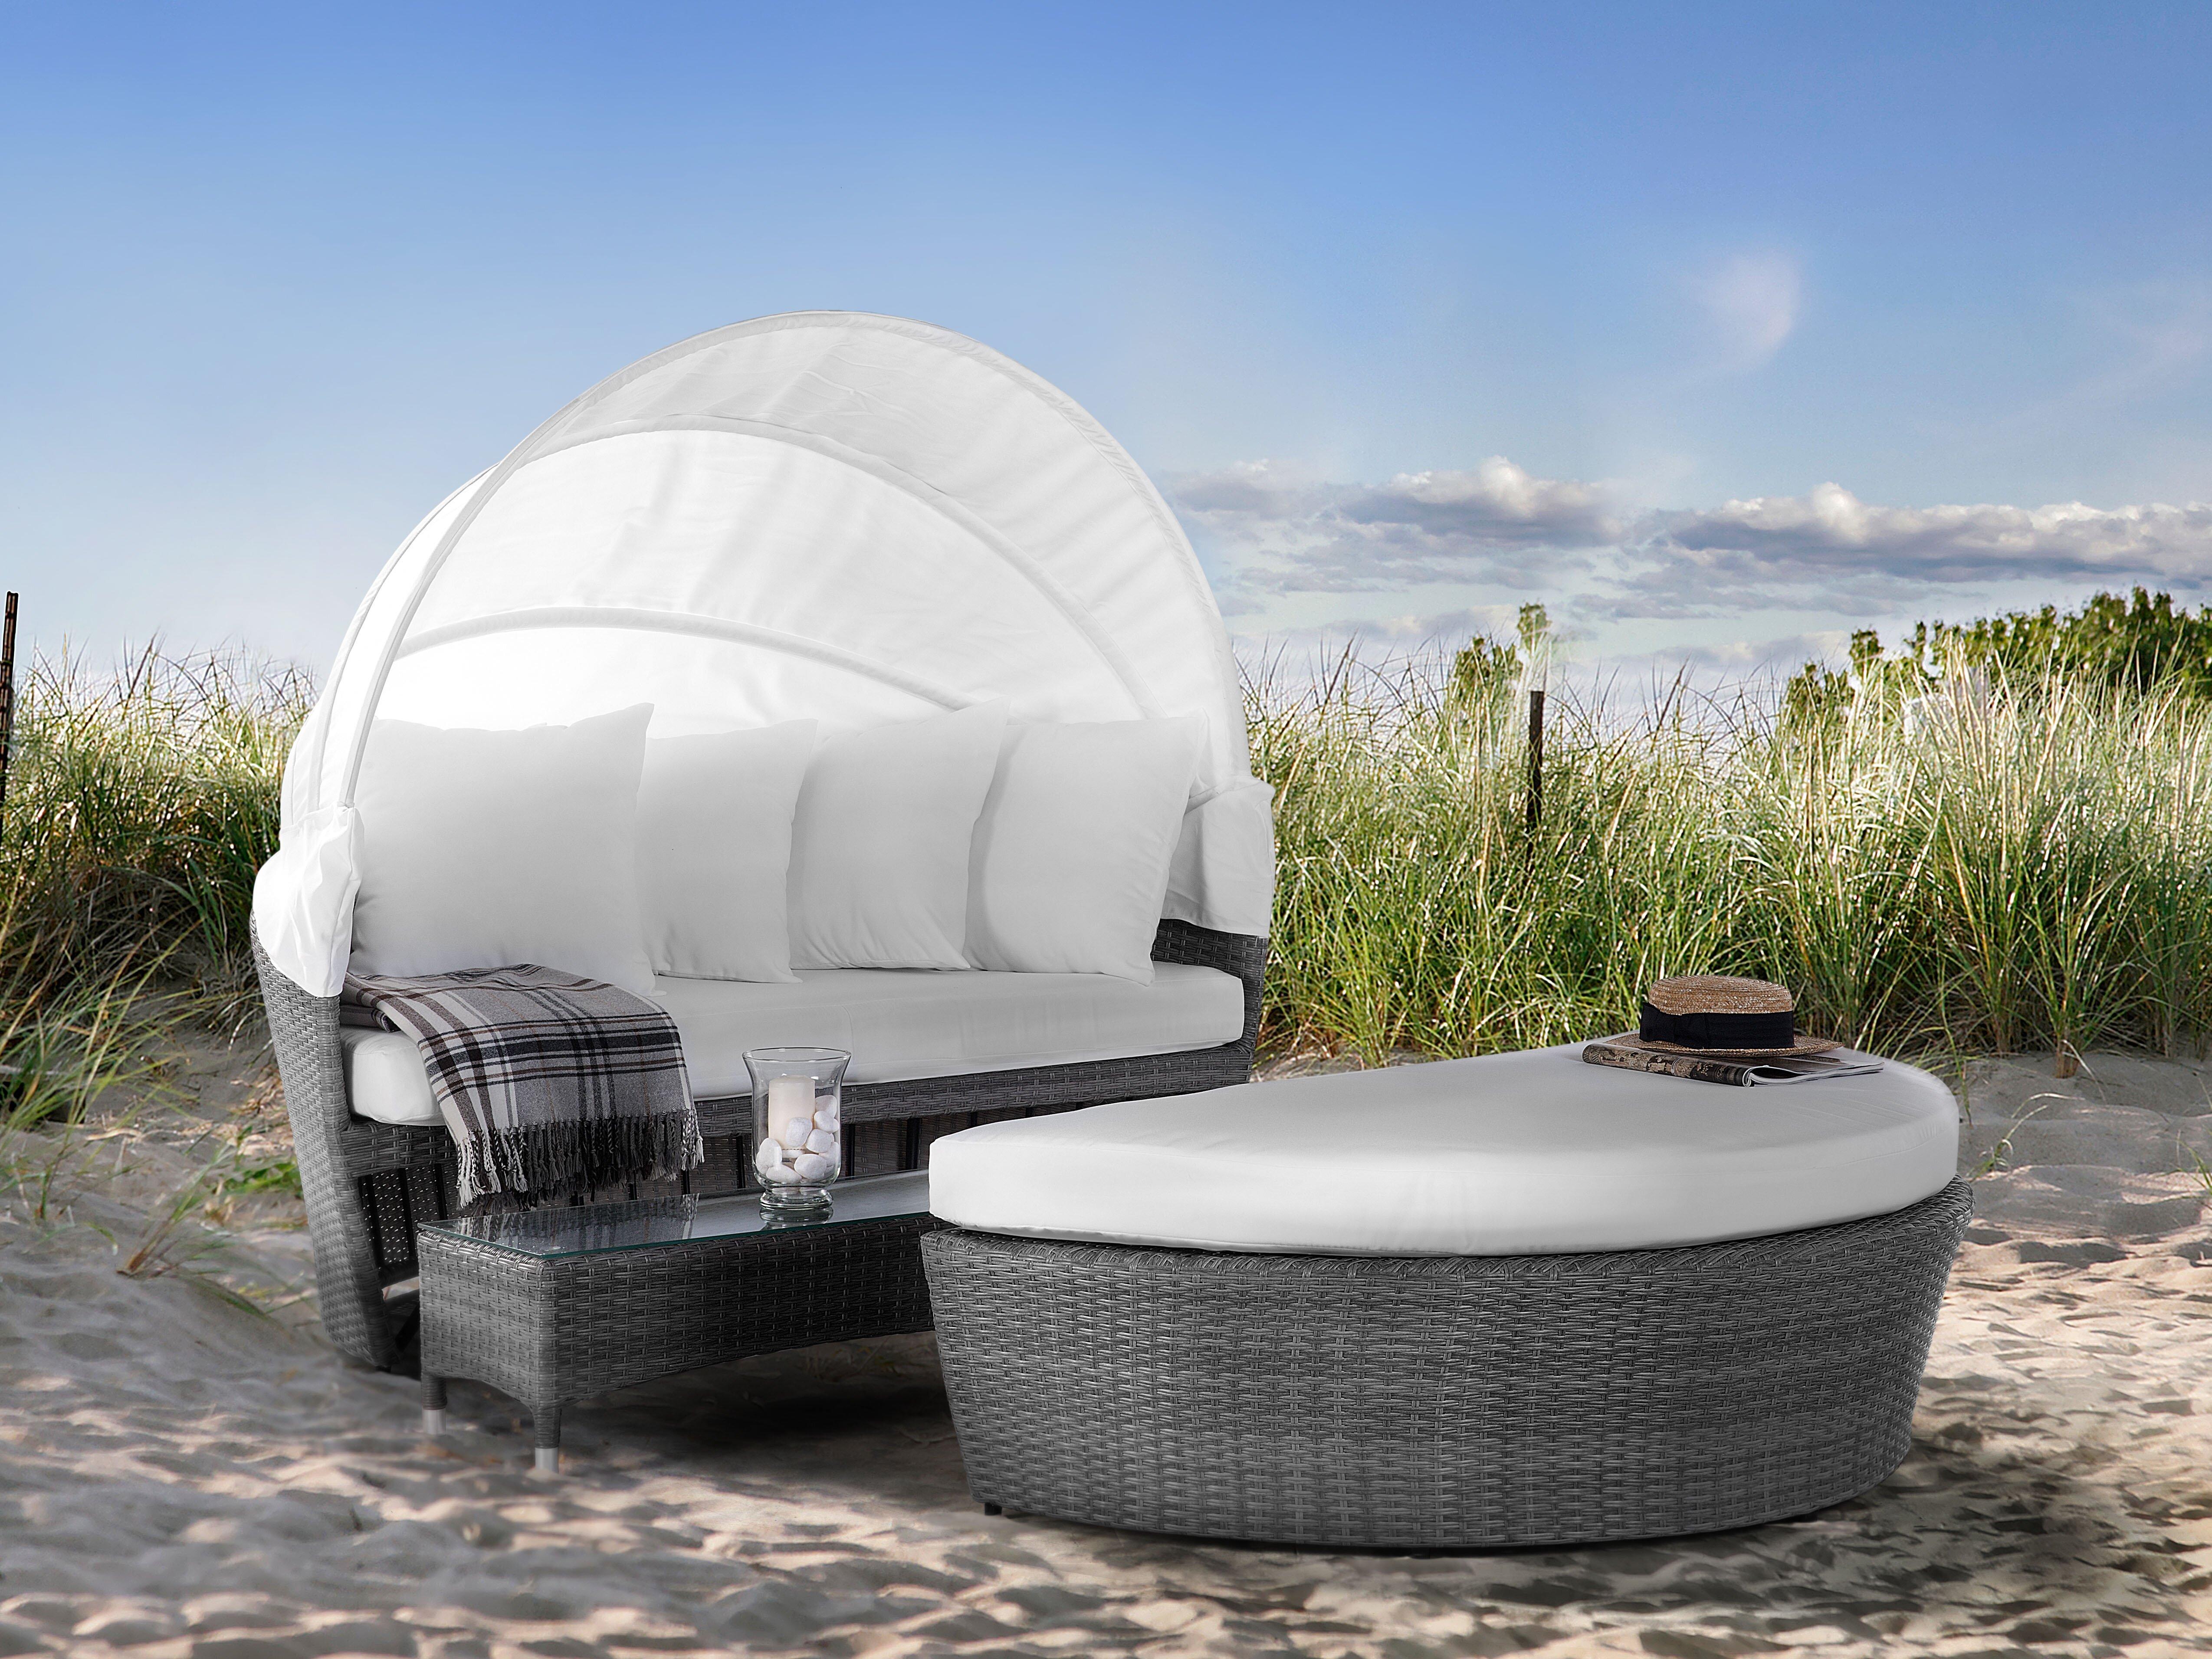 Dakota Fields 2 Piece Rattan Garden Daybed Set With Cushions Reviews Wayfair Co Uk